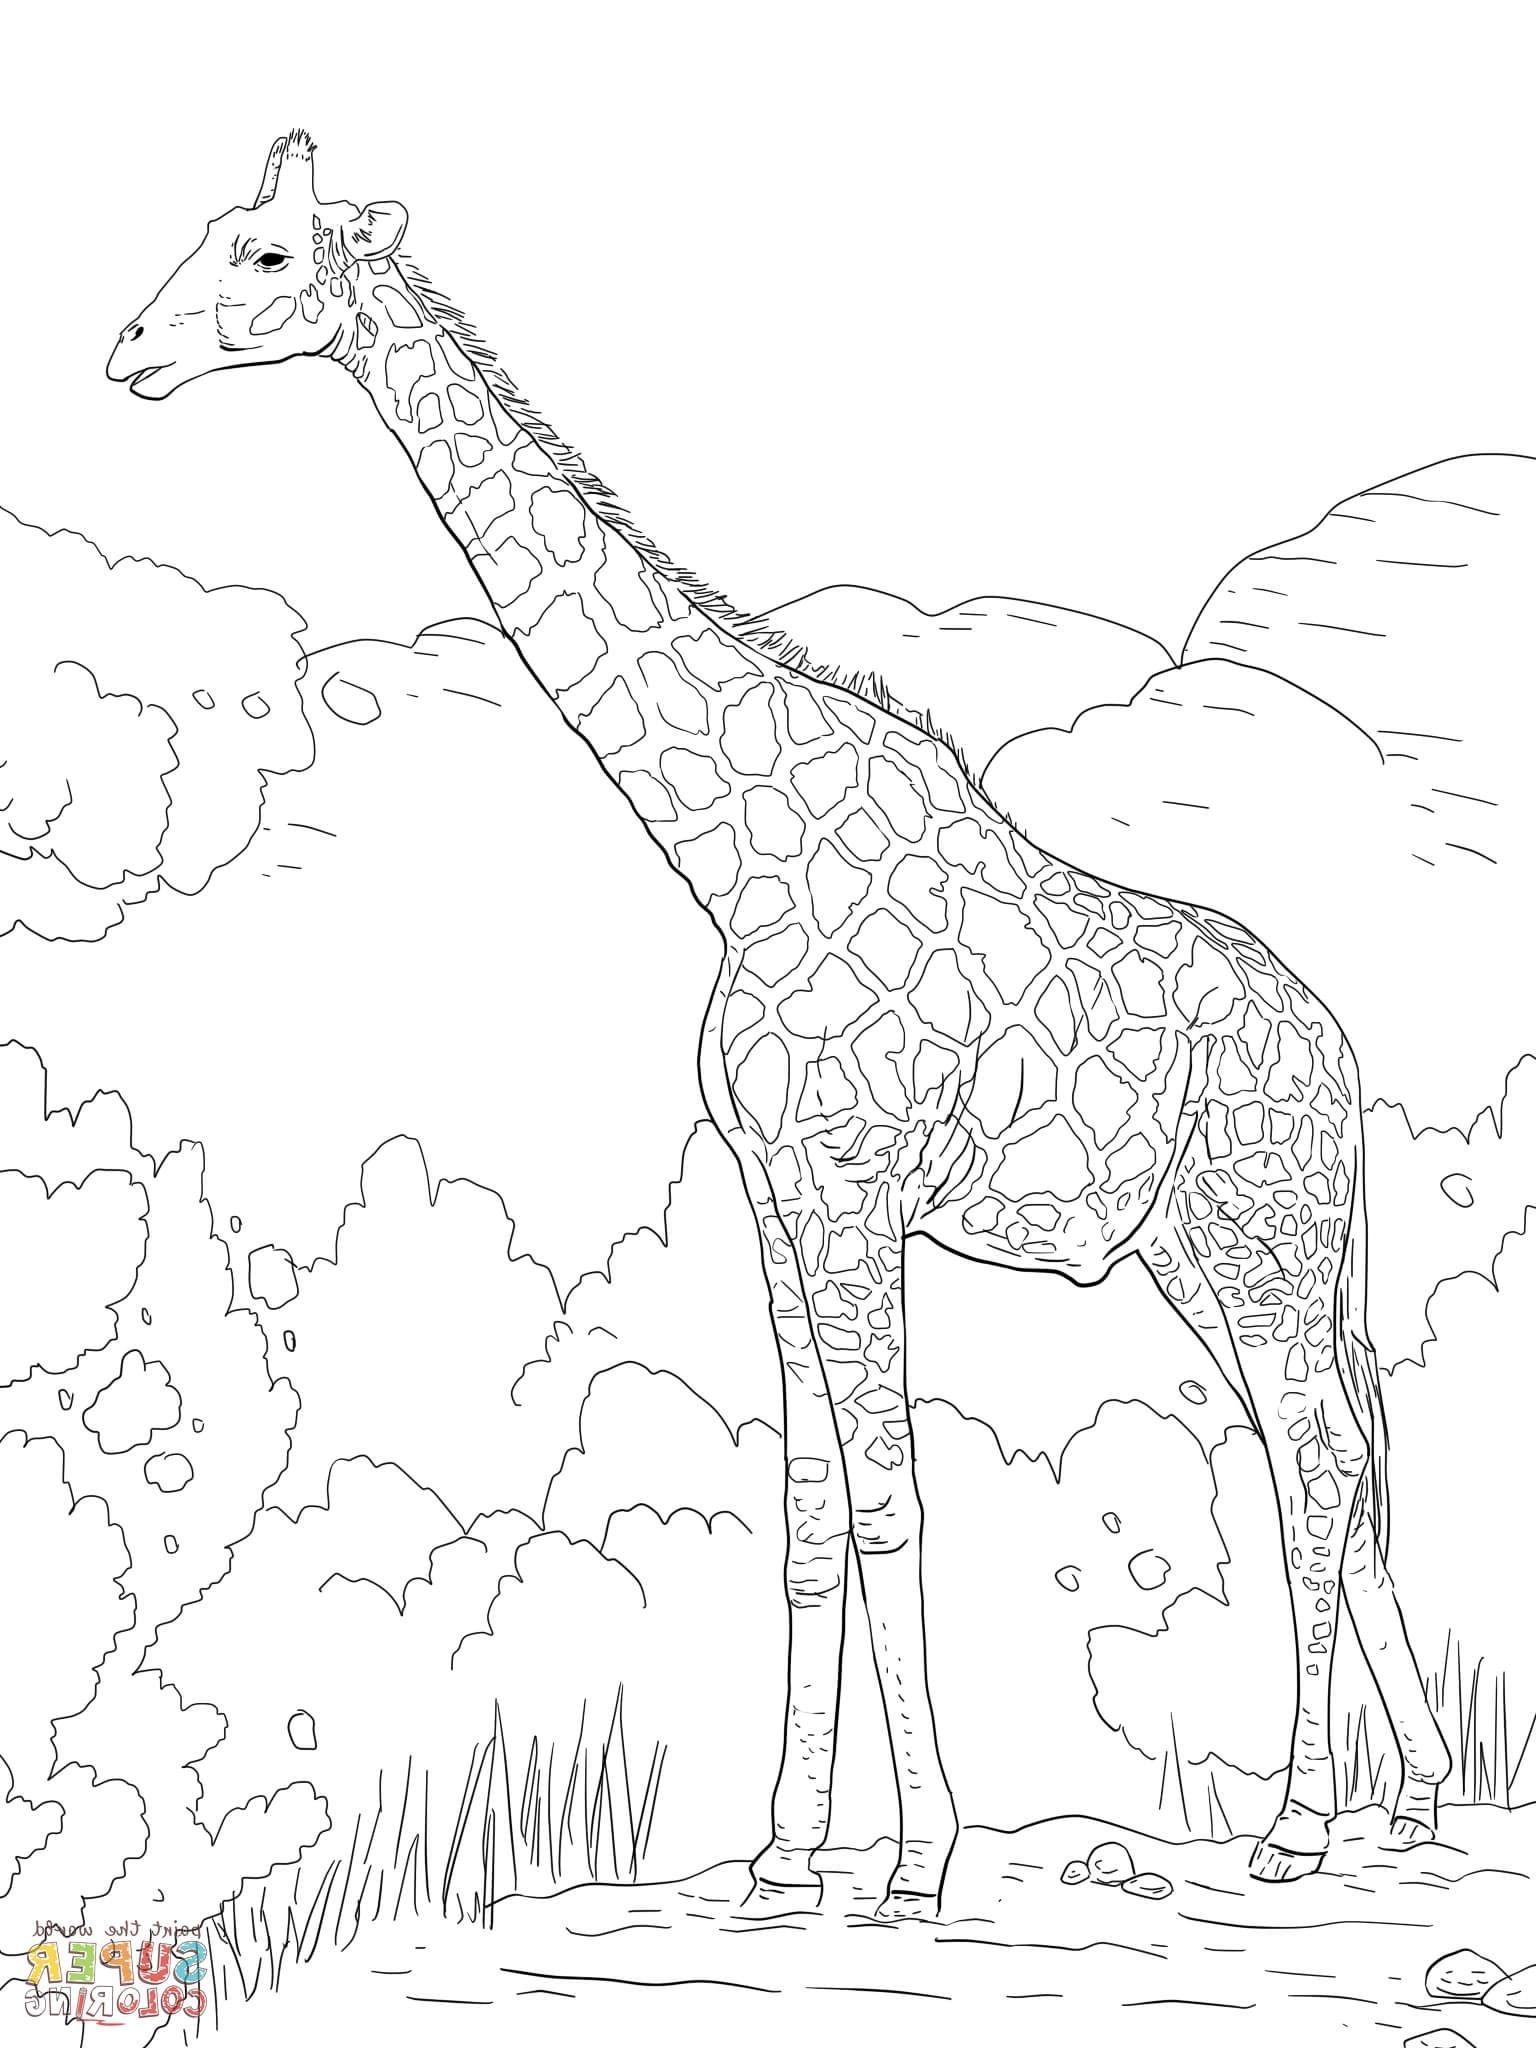 Giraffe Coloring Page Giraffe Coloring Pages Coloring Pages Giraffe Colors